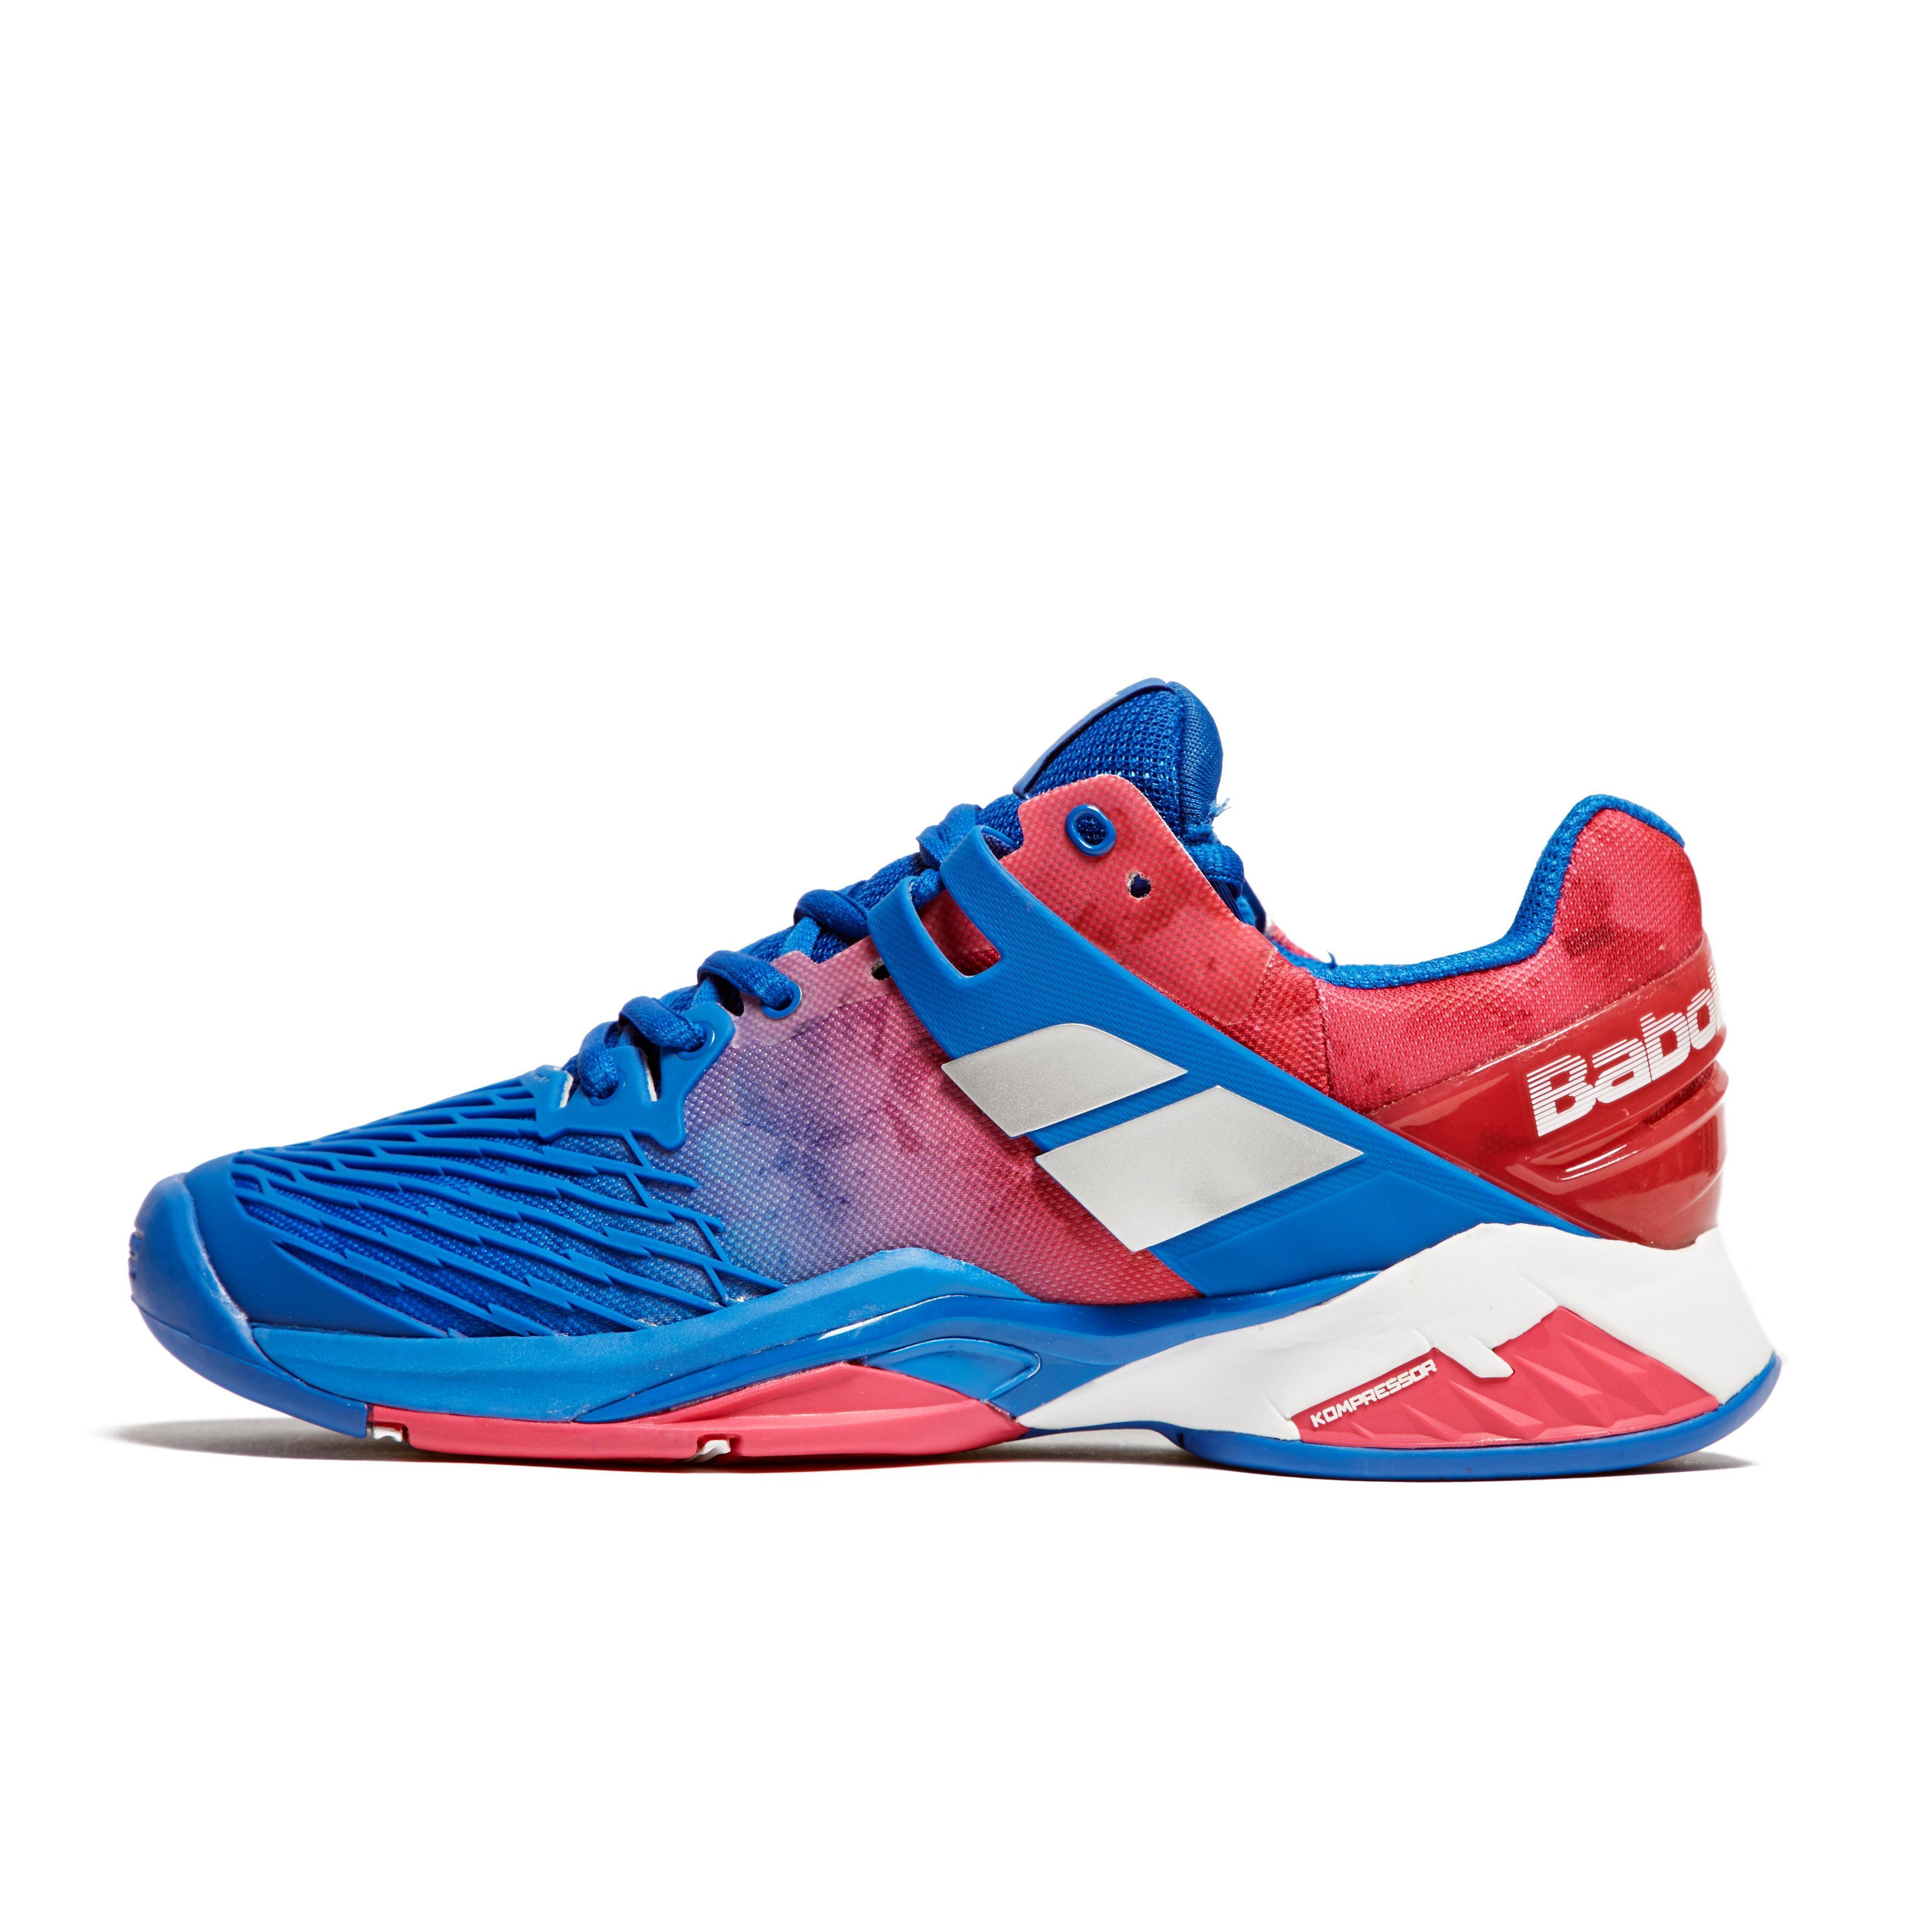 Babolat Tennis Shoes >> Details About Babolat Fury All Court Women S Tennis Shoes